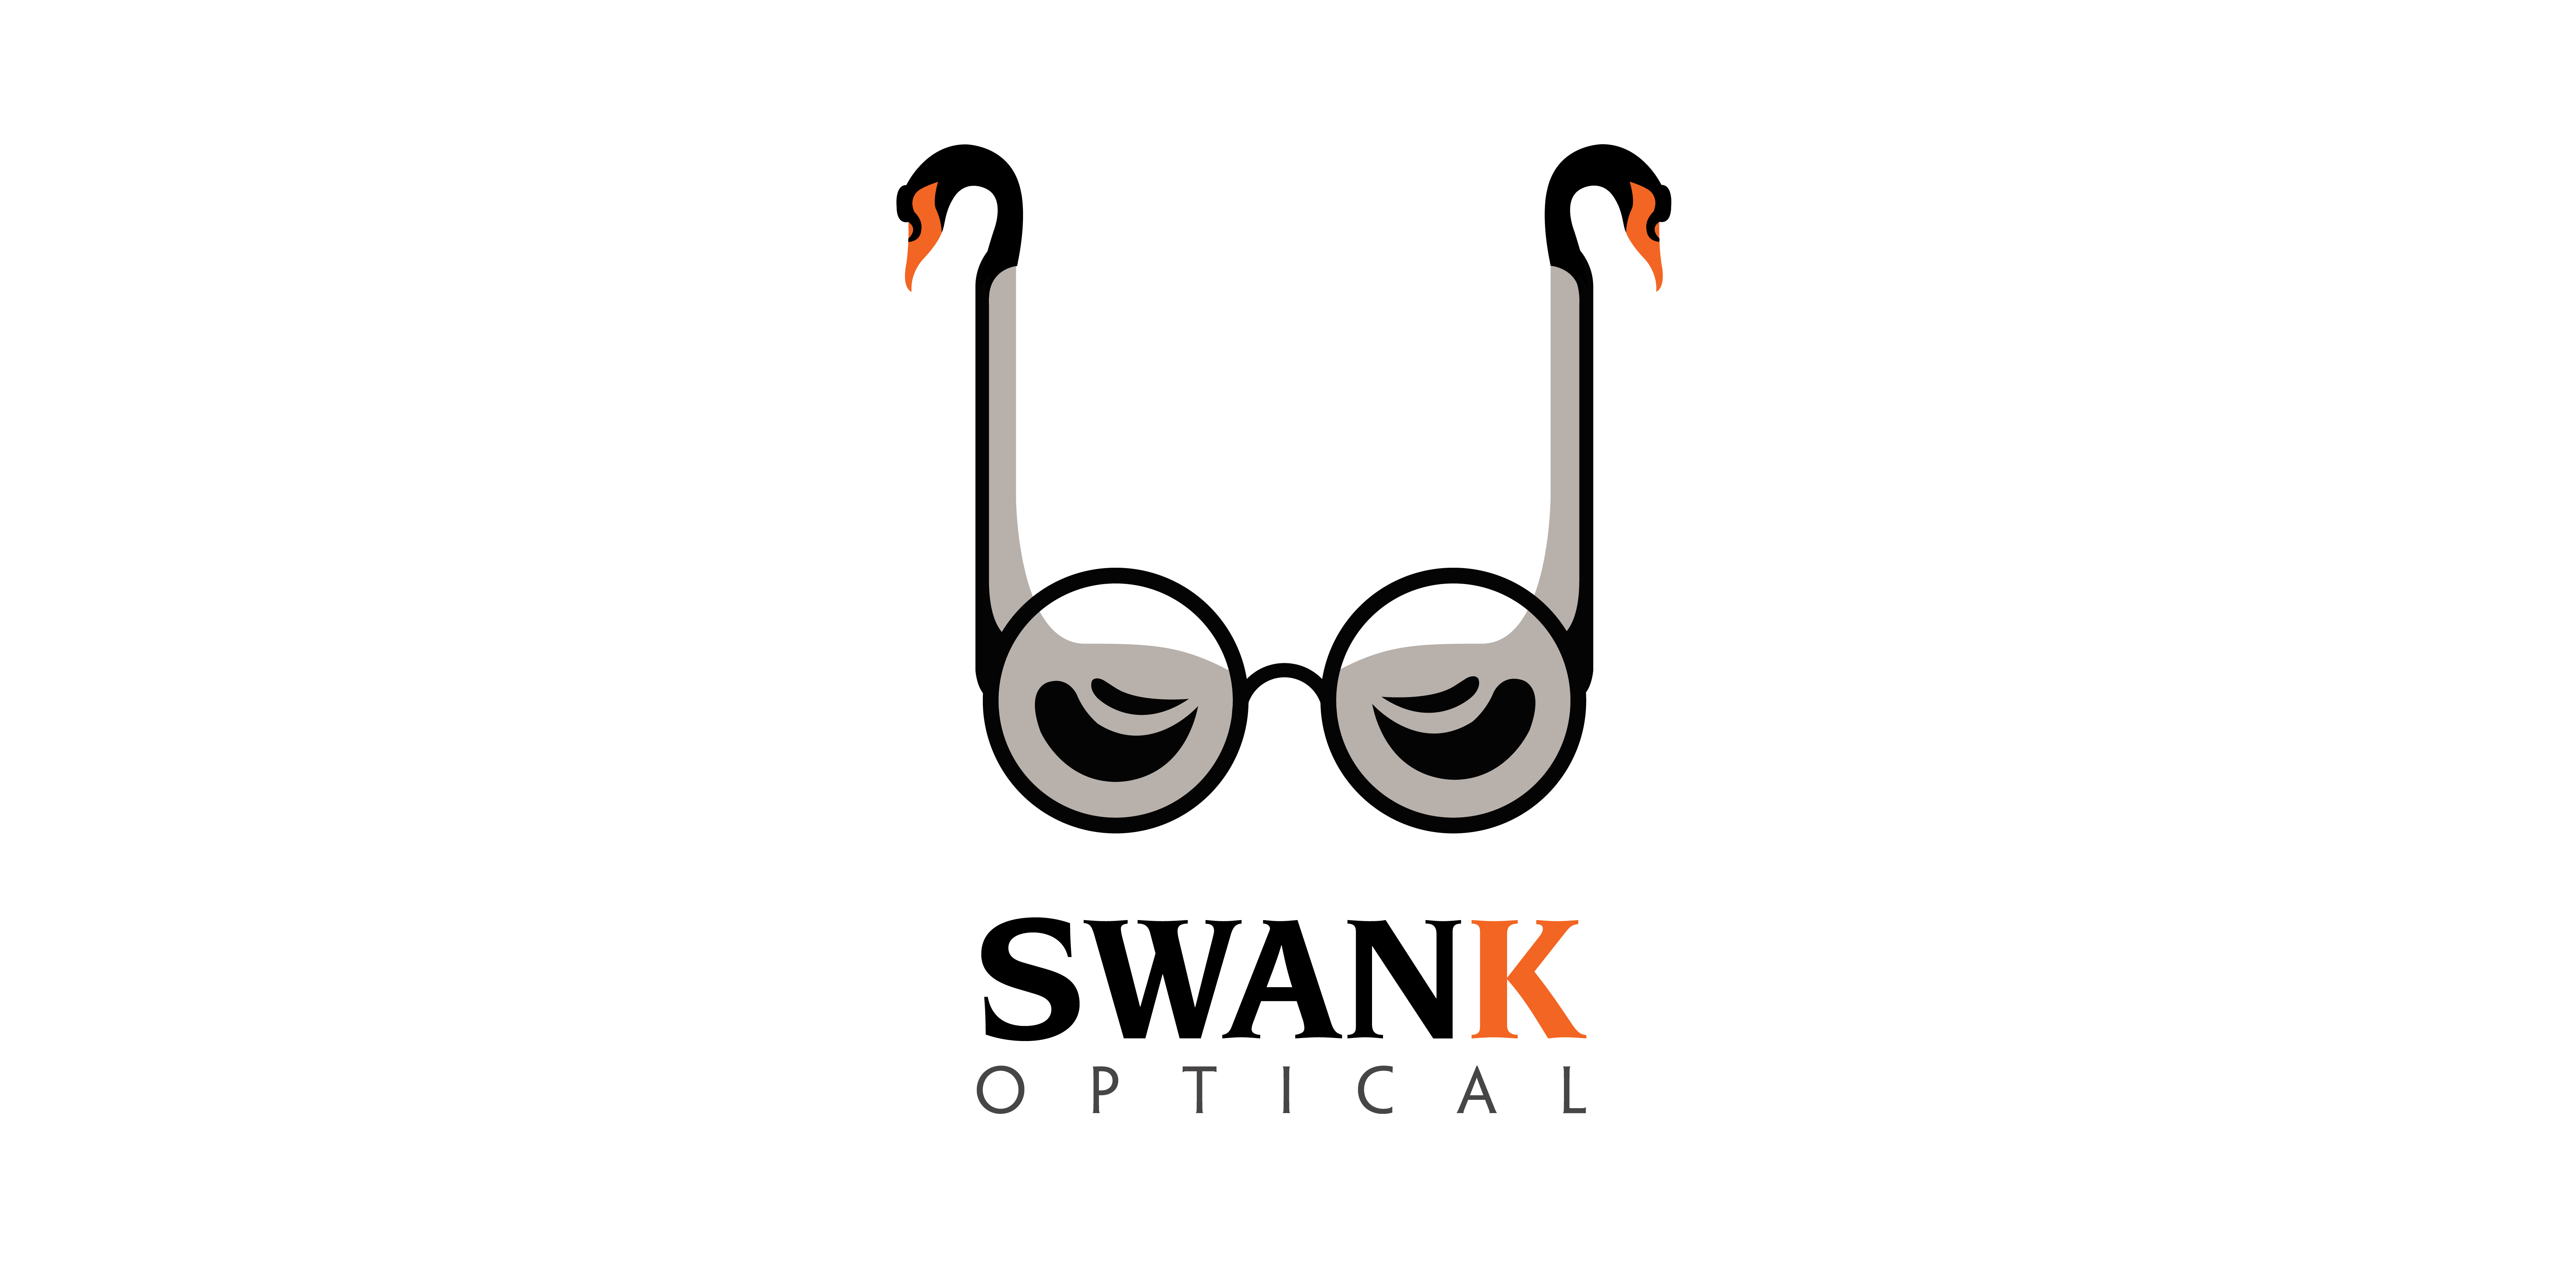 Swank Optical